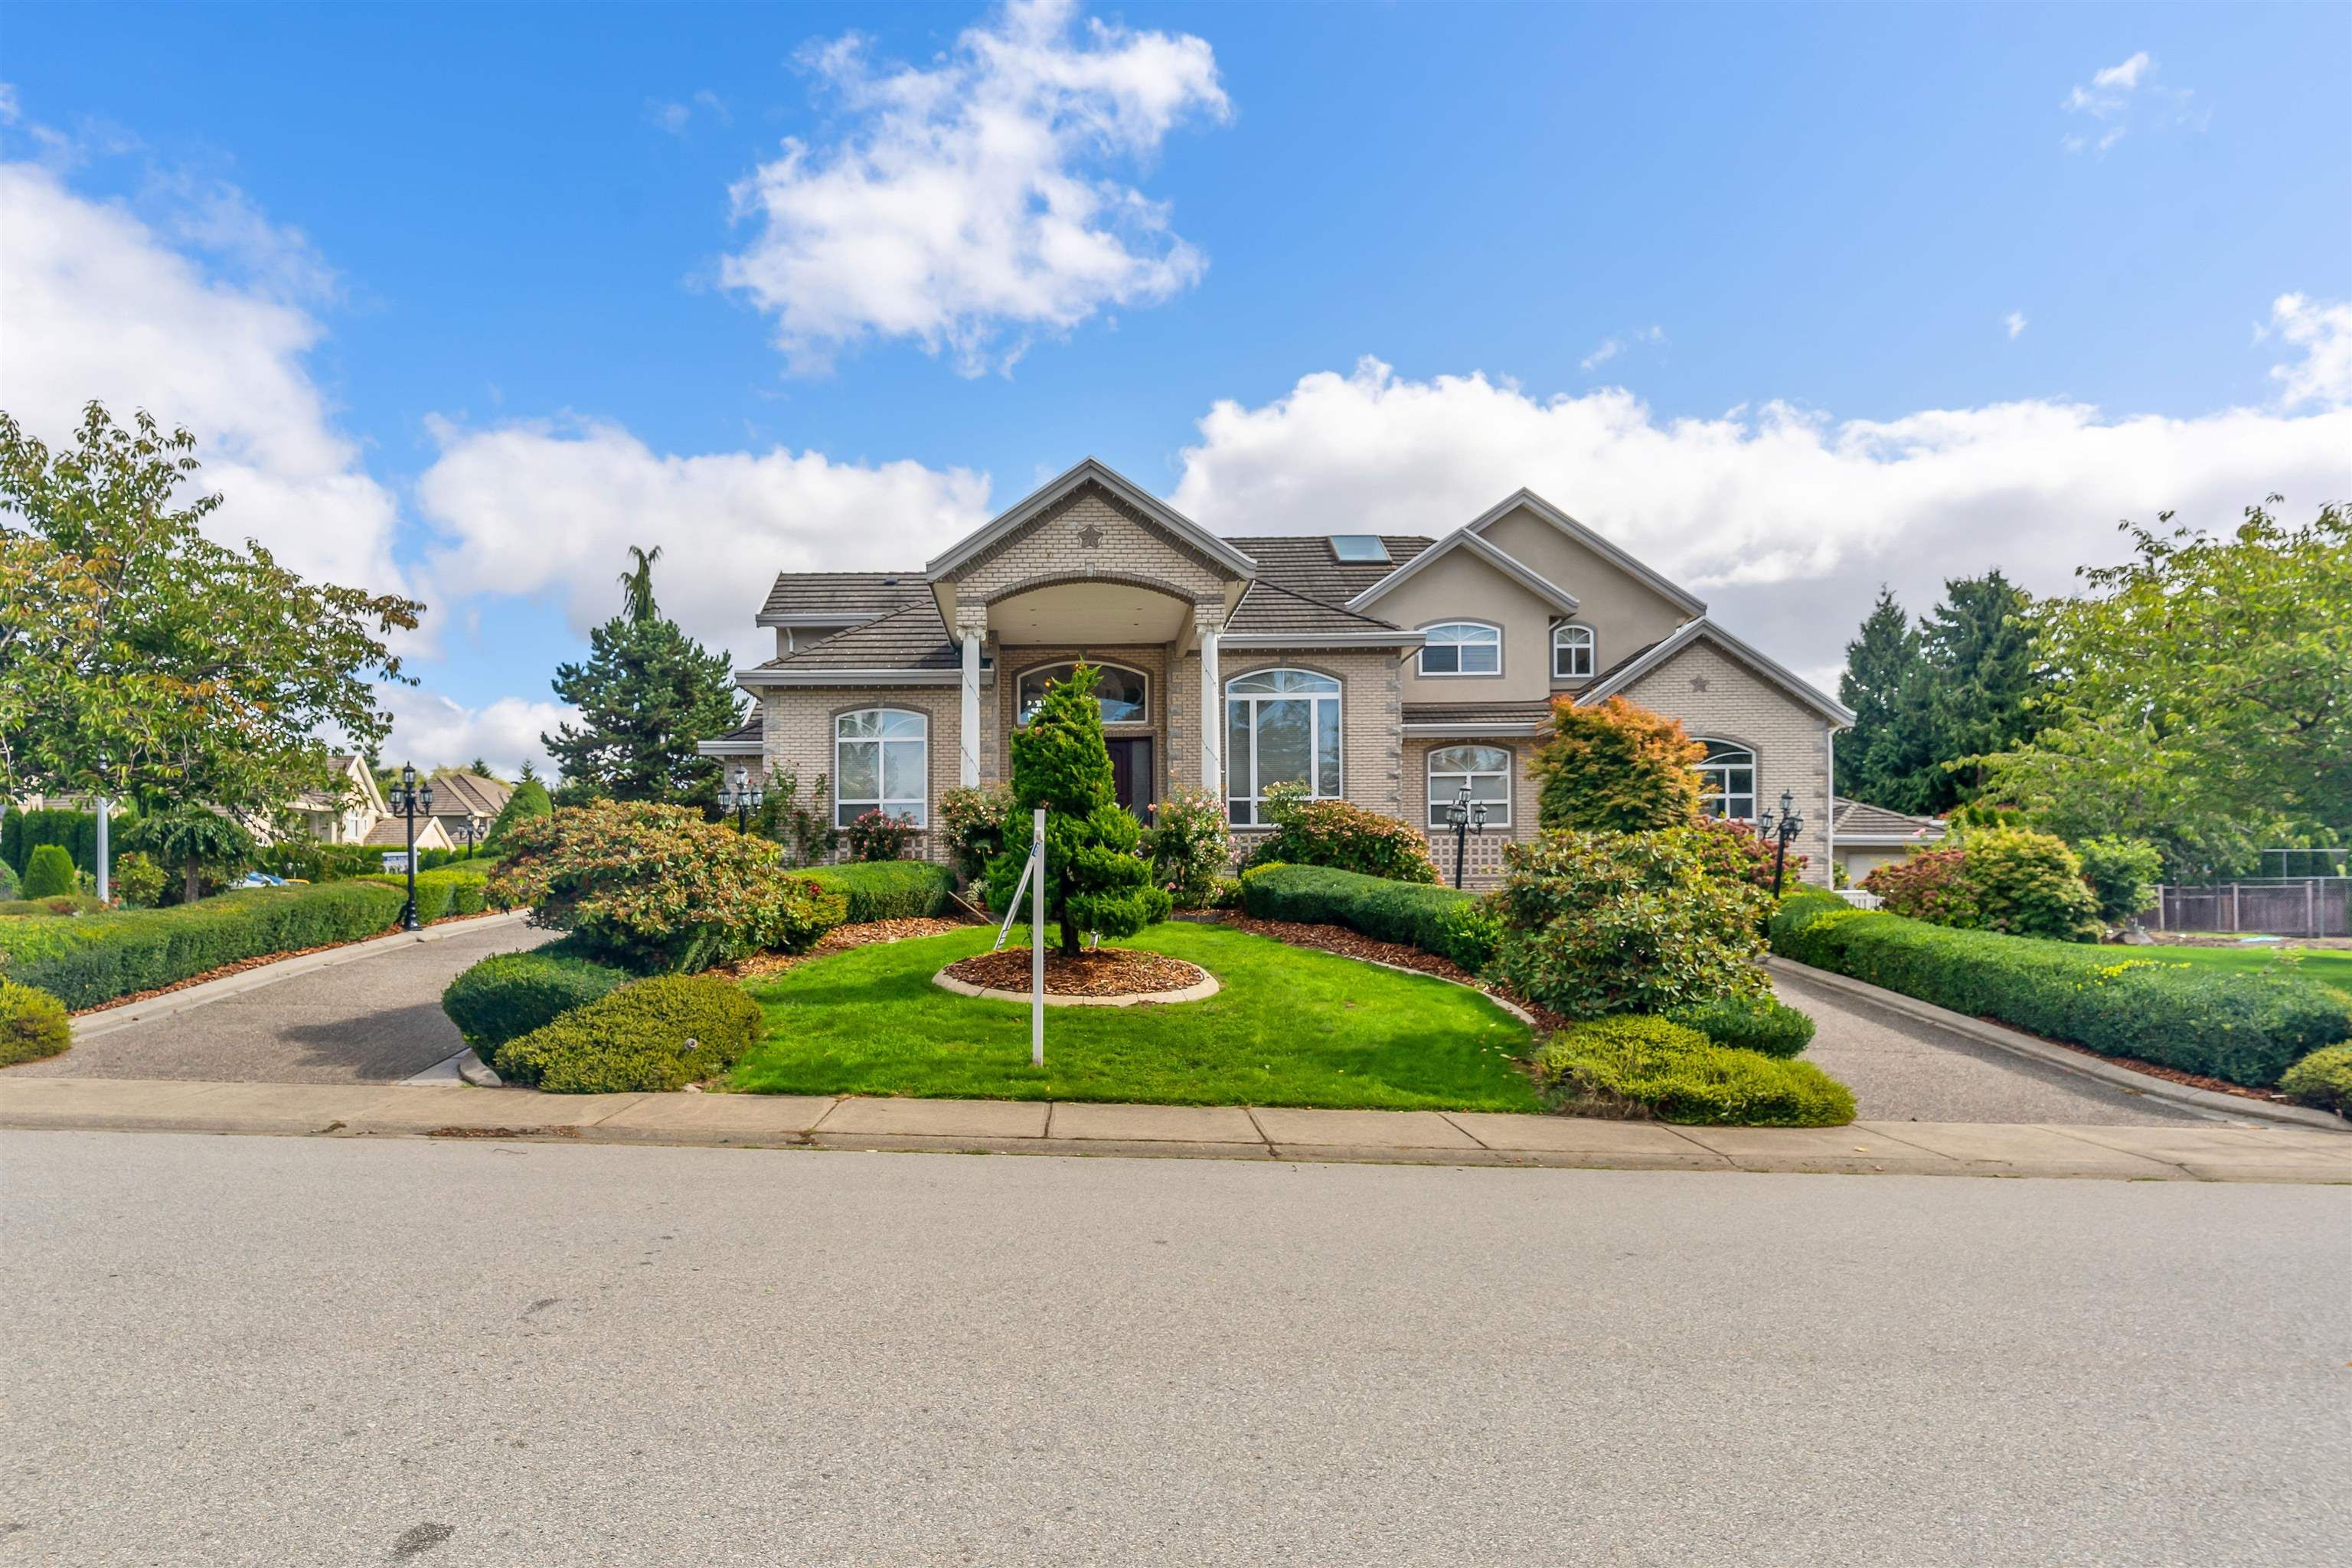 Main Photo: 5748 123 Street in Surrey: Panorama Ridge House for sale : MLS®# R2616639